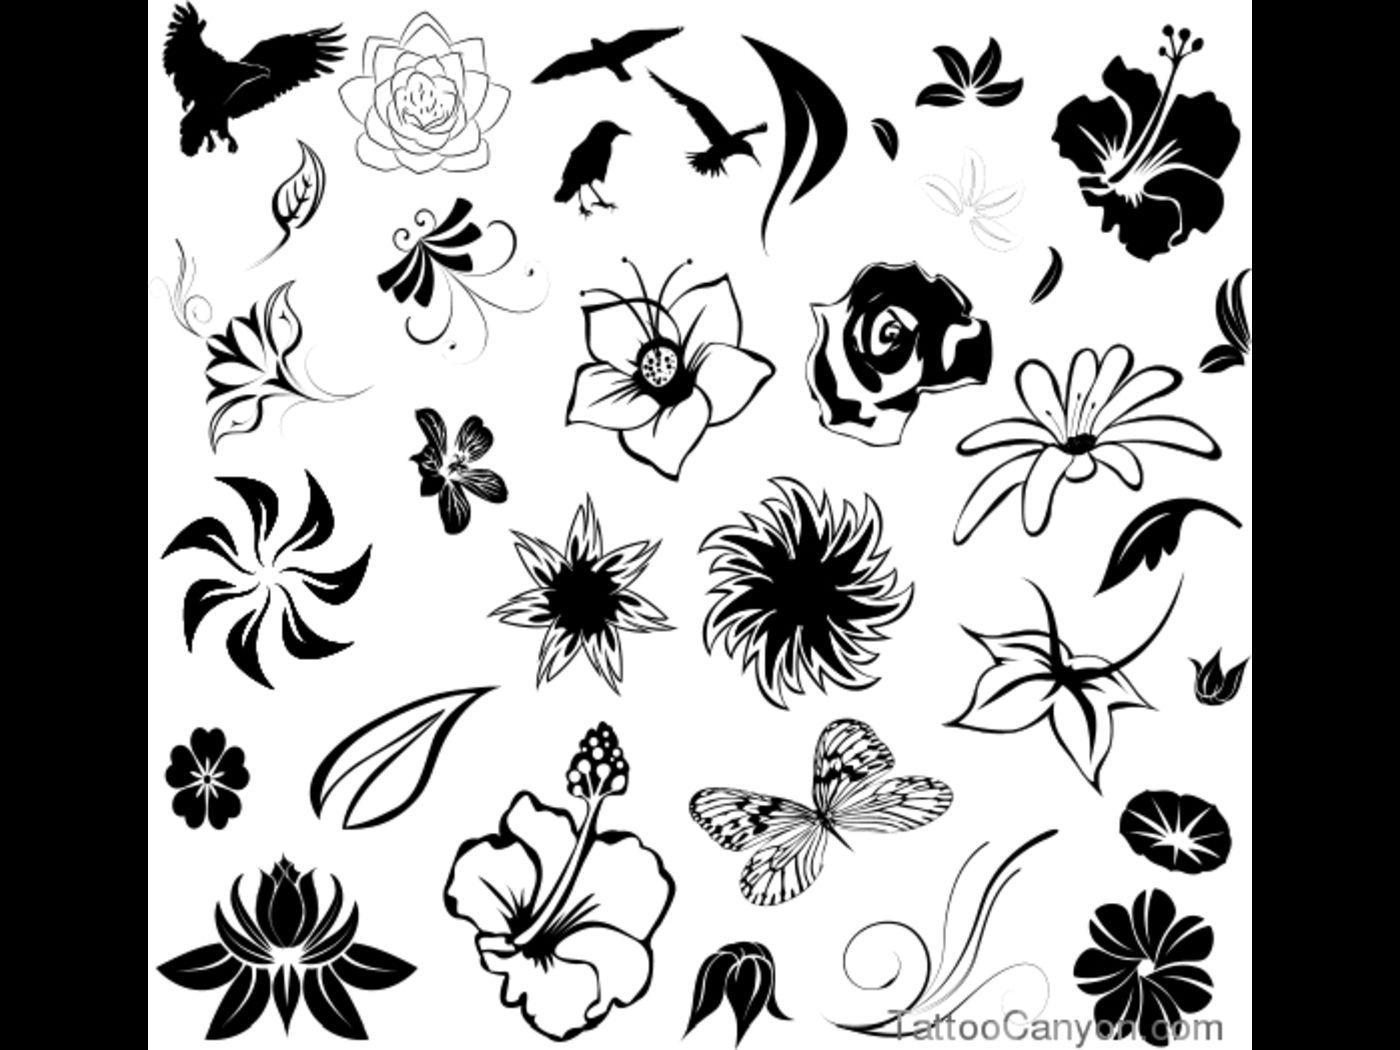 12307 query hawaiian flower tattoos animal tattoo designs tattoo 12307 query hawaiian flower tattoos animal tattoo designs izmirmasajfo Choice Image